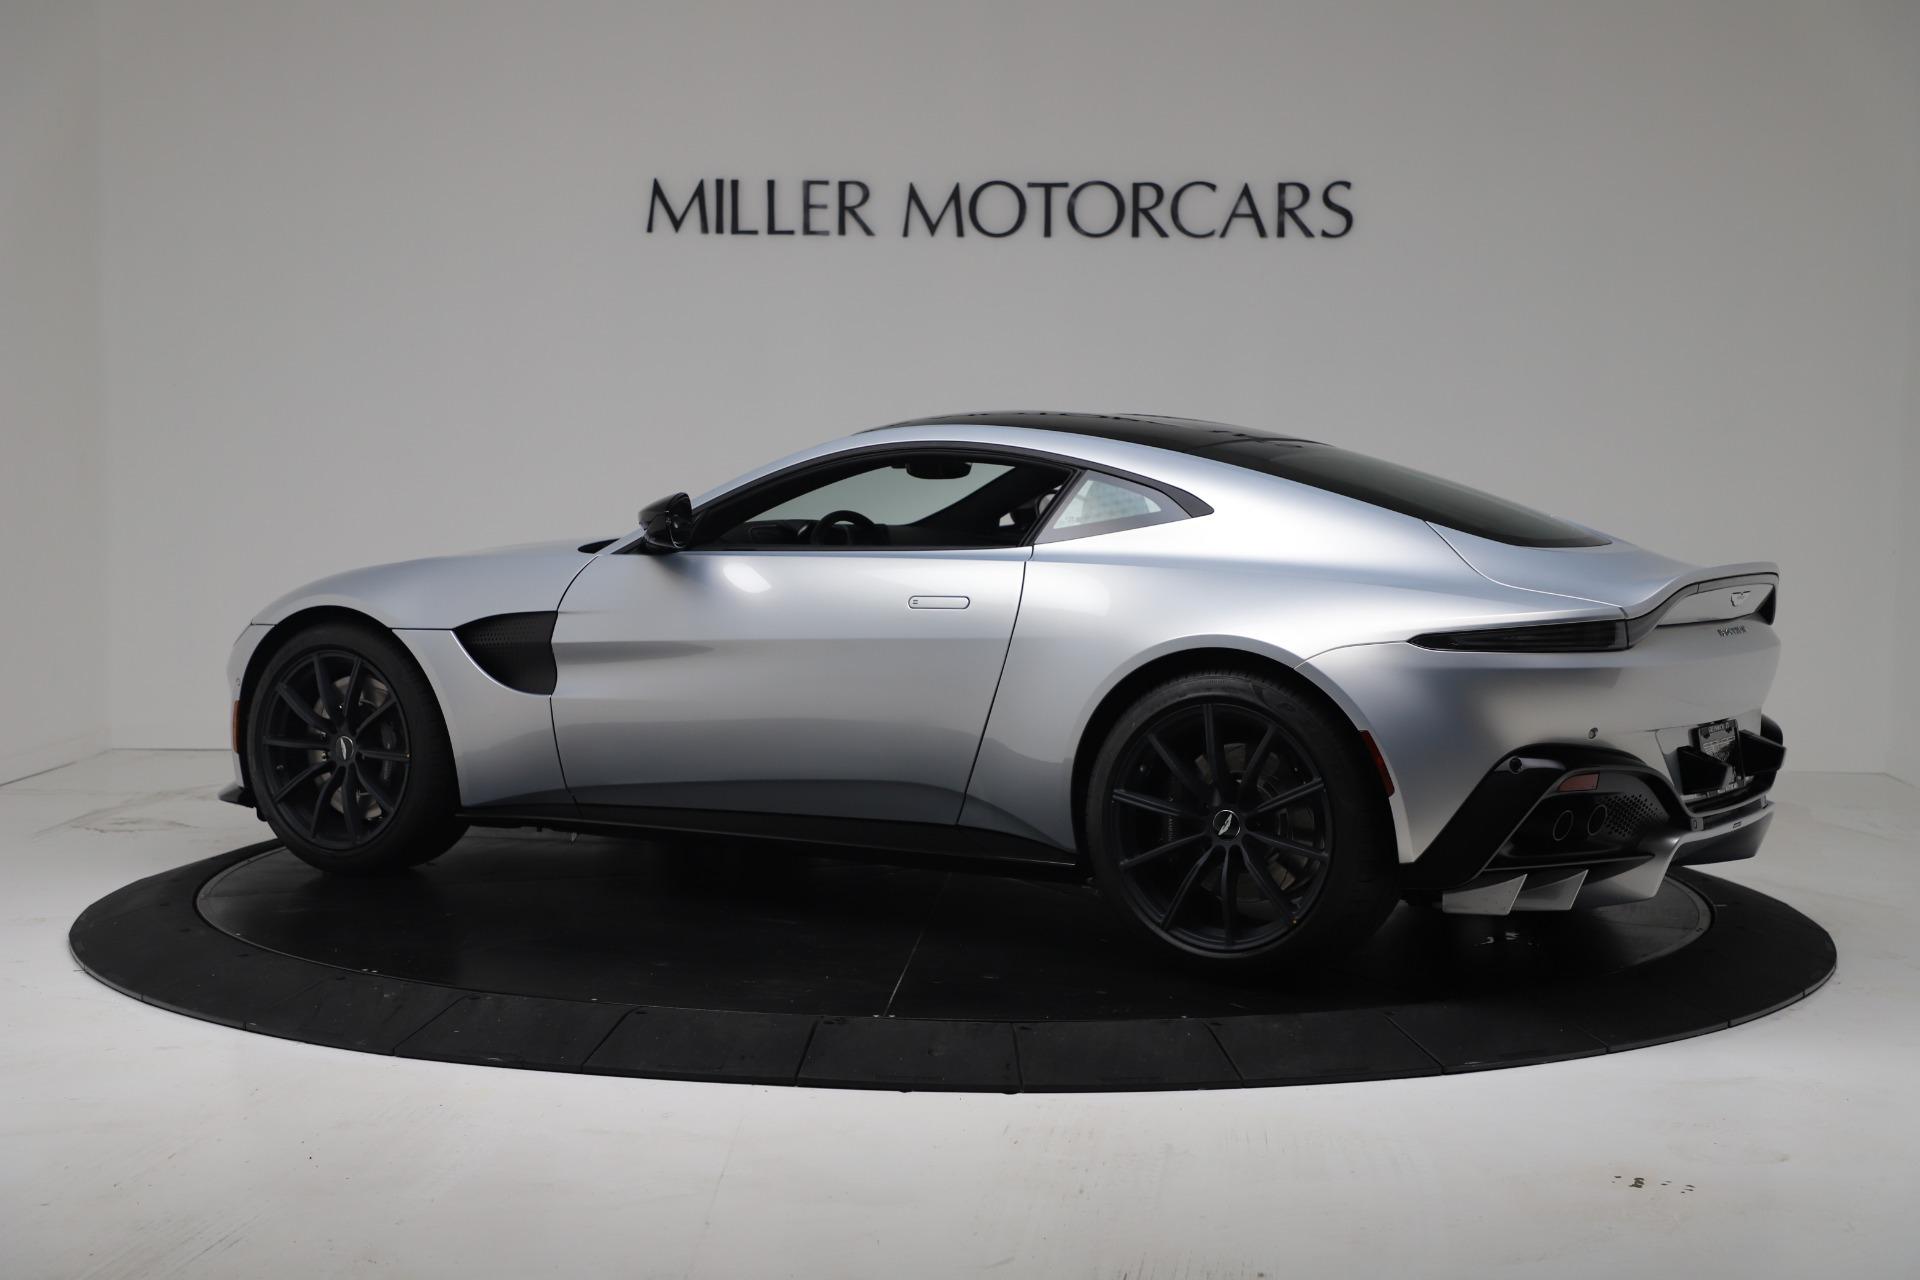 New 2020 Aston Martin Vantage V8 For Sale In Westport, CT 3481_p20